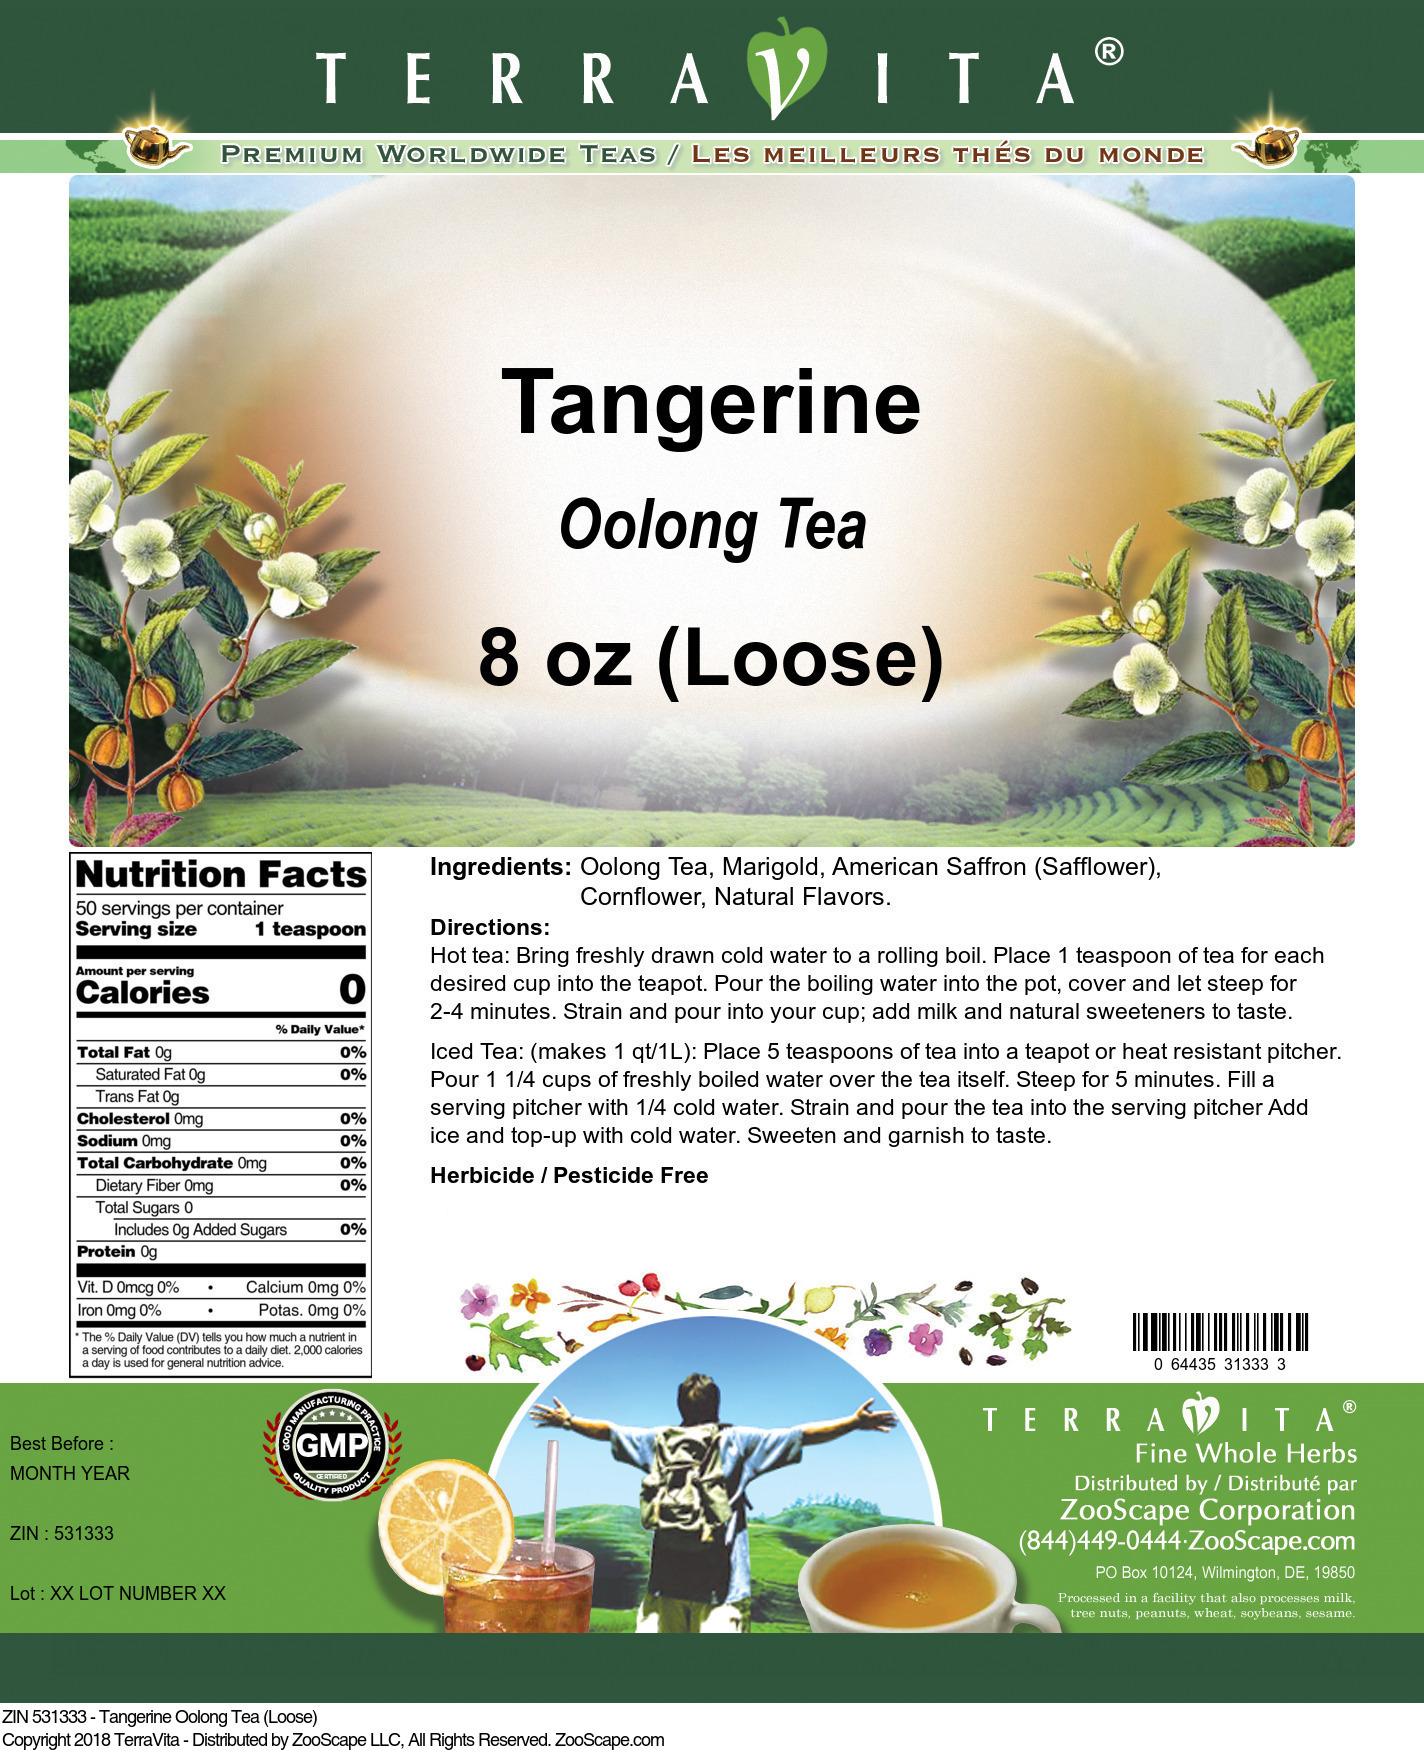 Tangerine Oolong Tea